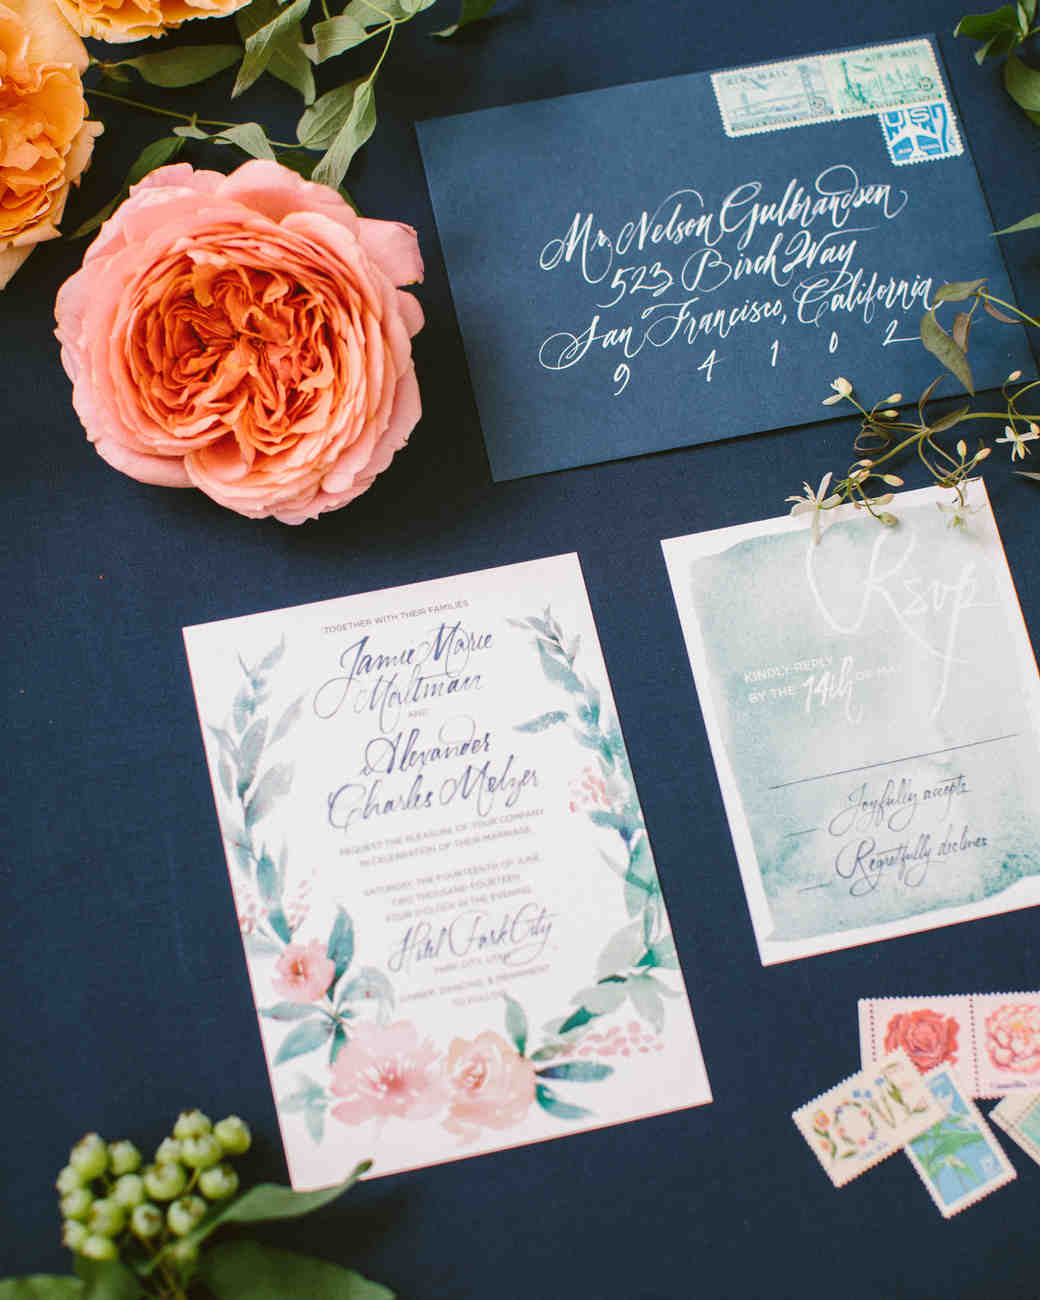 Addressing Wedding Invitations To Hookup Couples